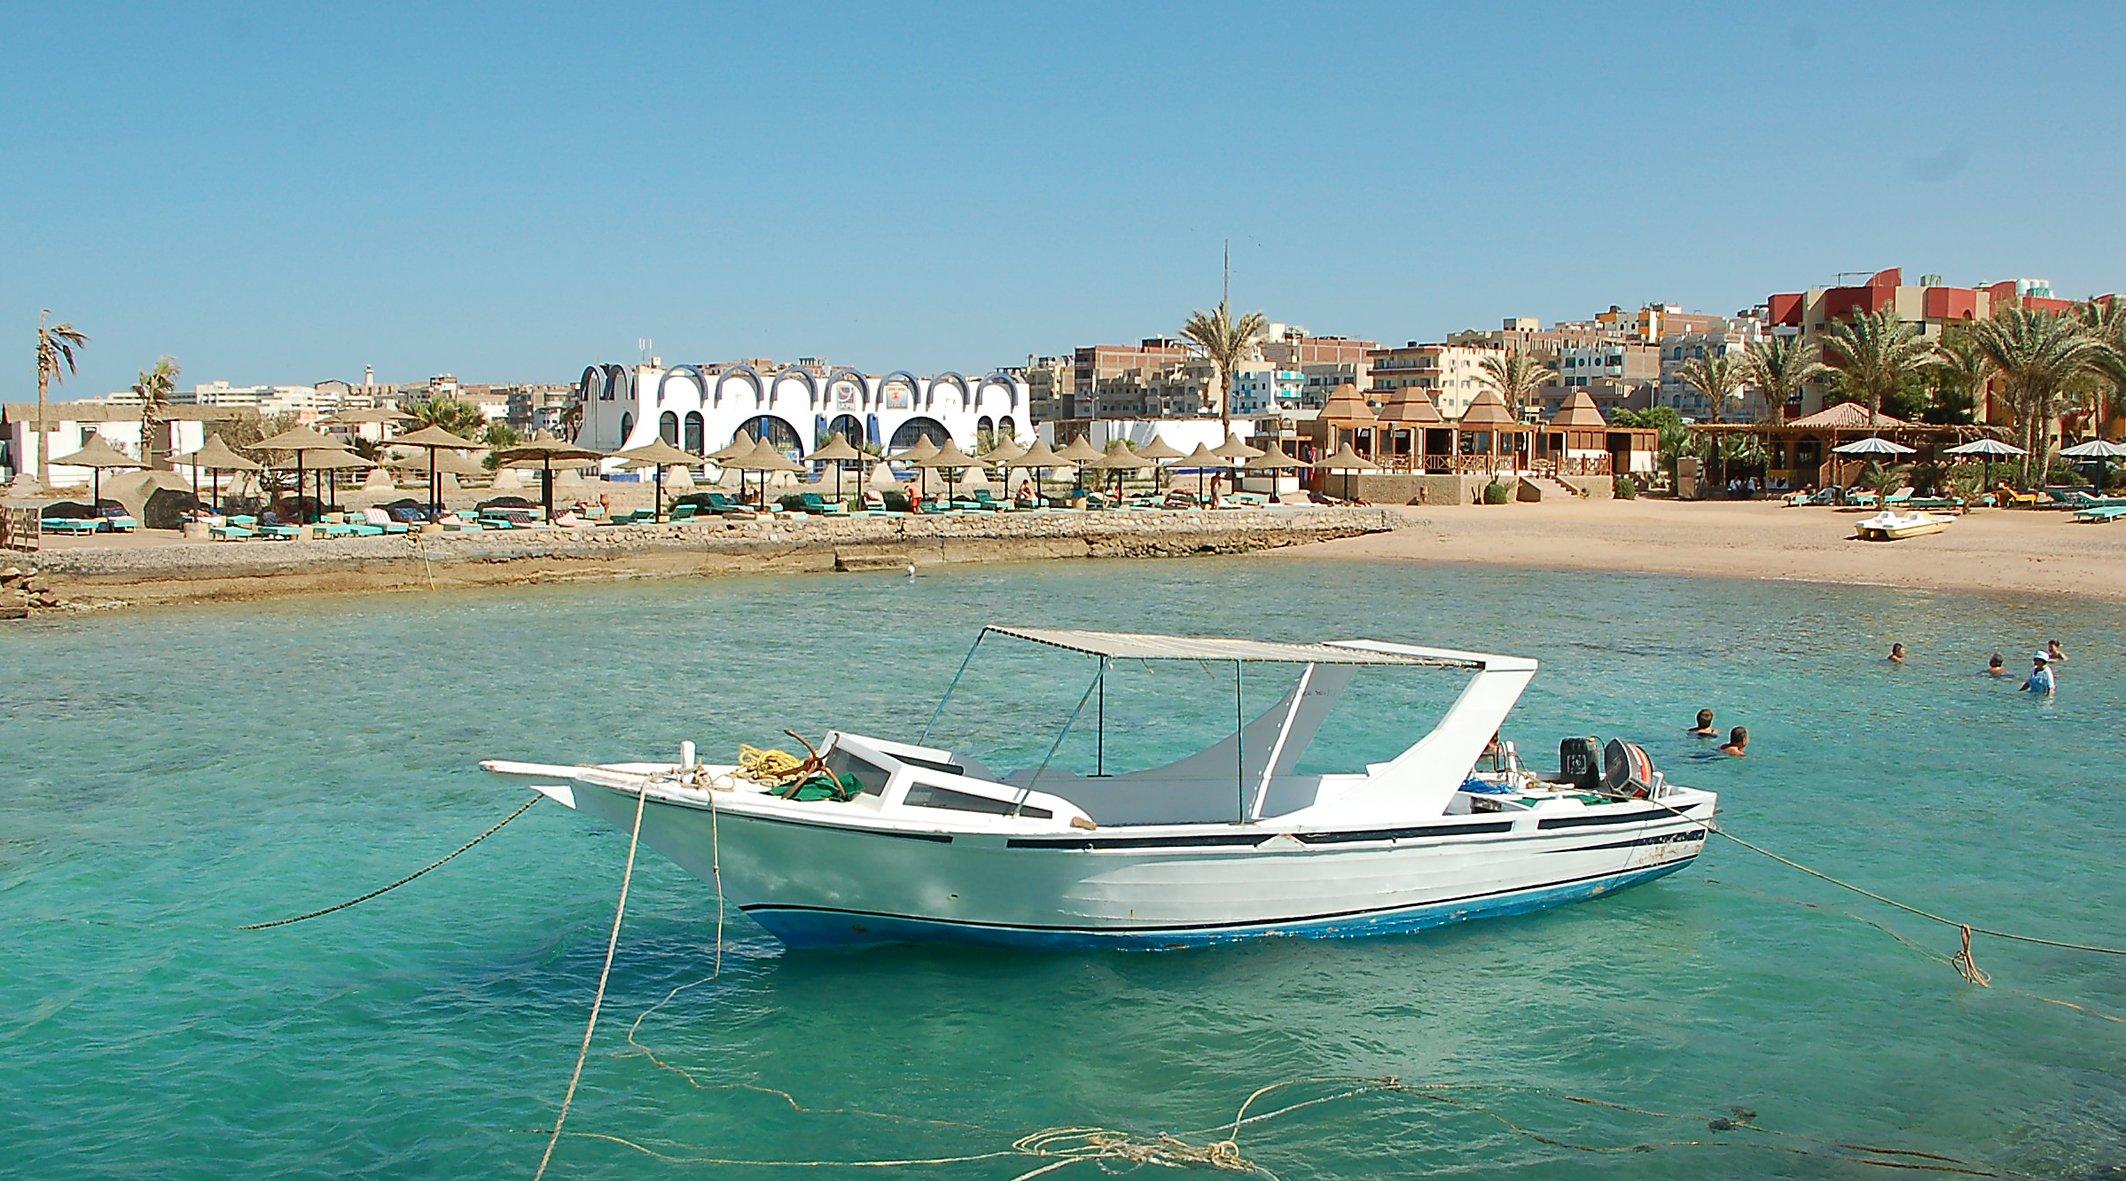 Boot bei Hurghada. Foto: Christian Maskos